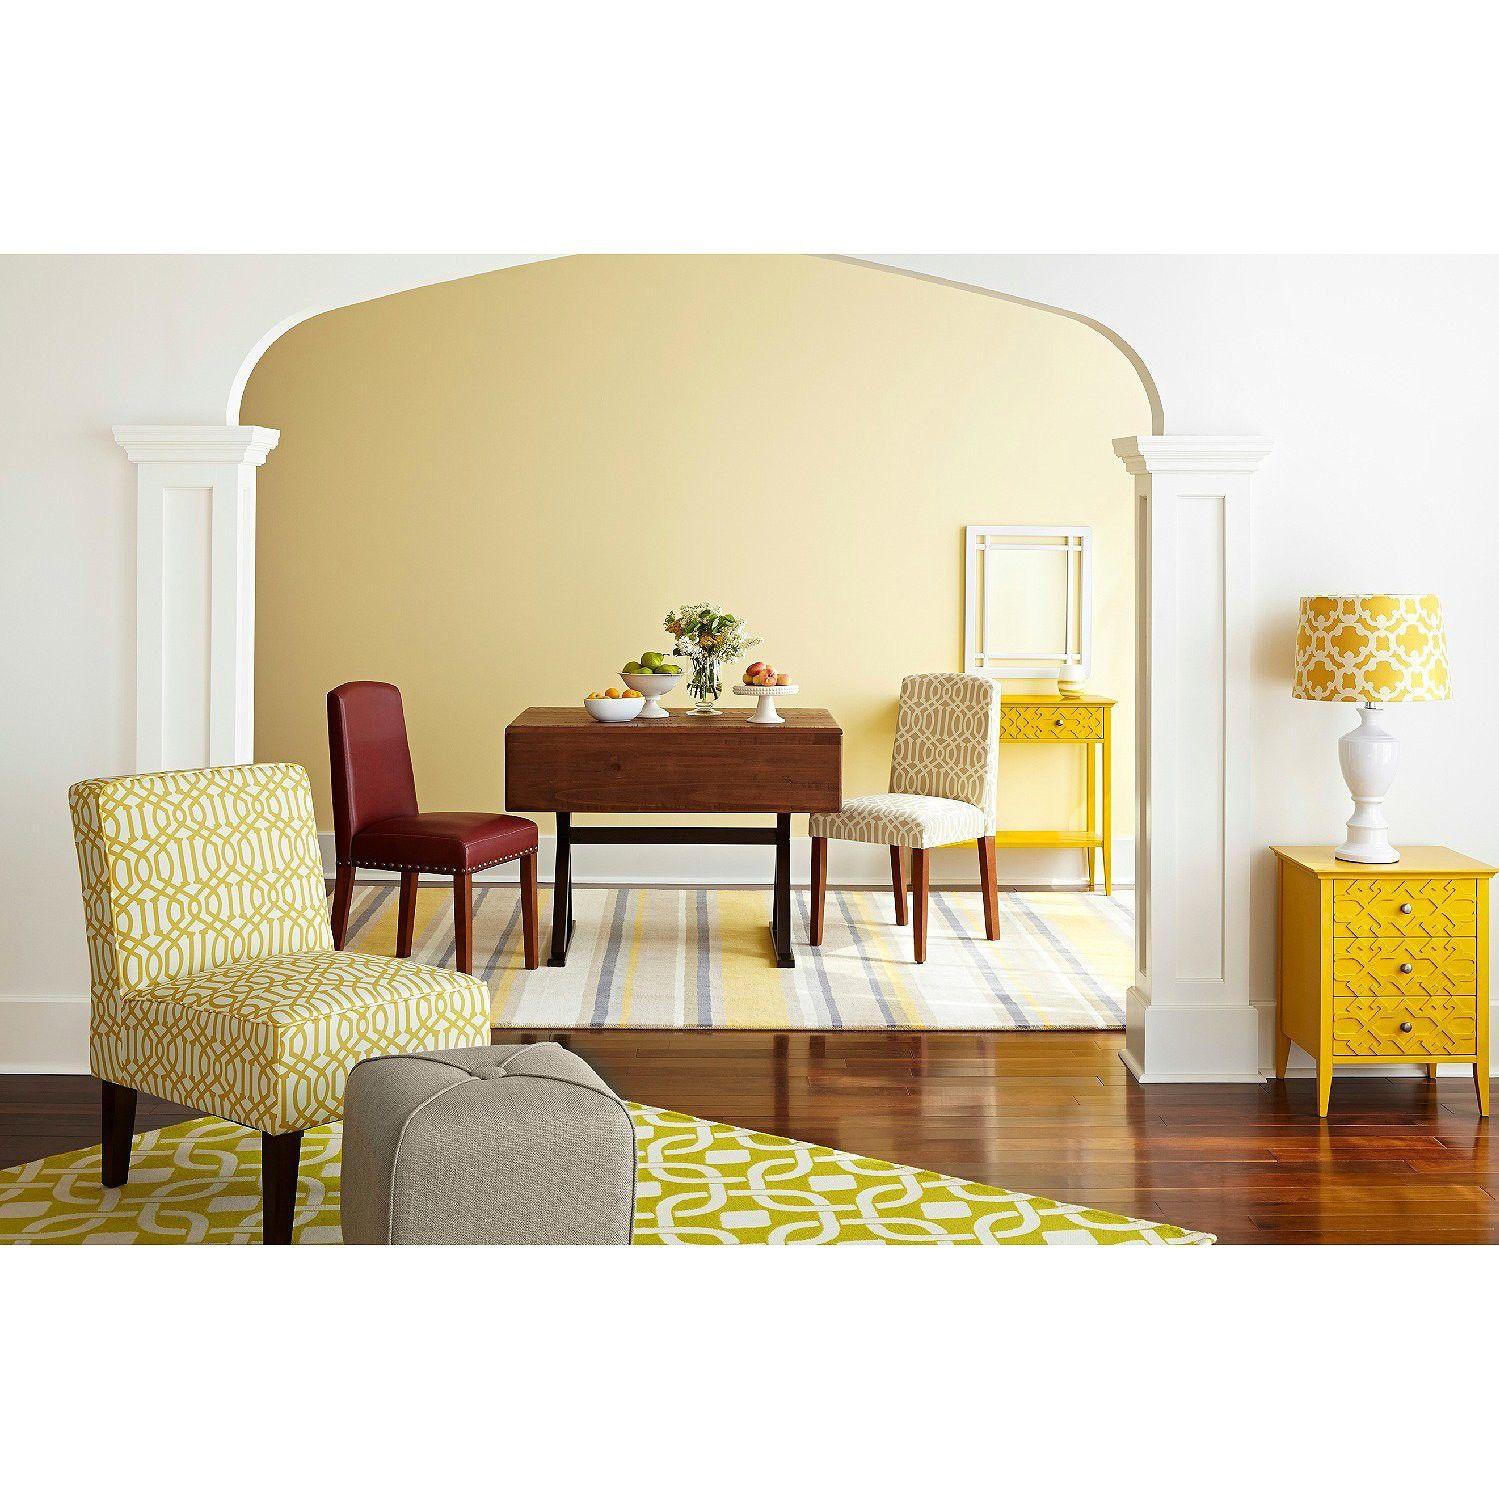 Threshold™ Fretwork Console Table : Target | foyer | Pinterest ...